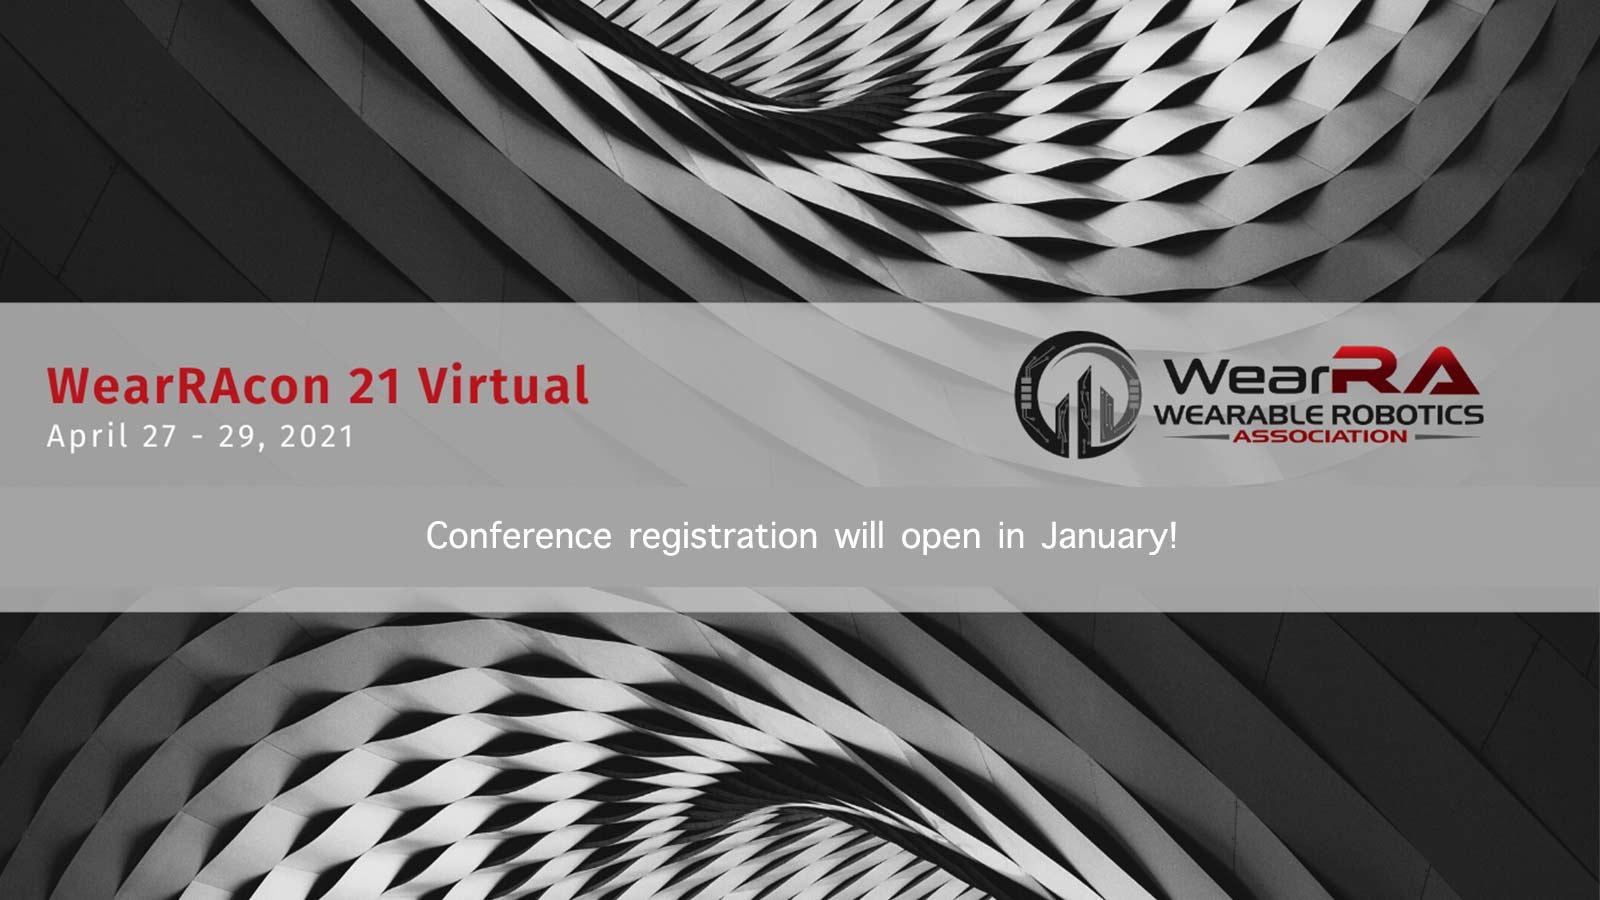 WearRAcon21 Virtual